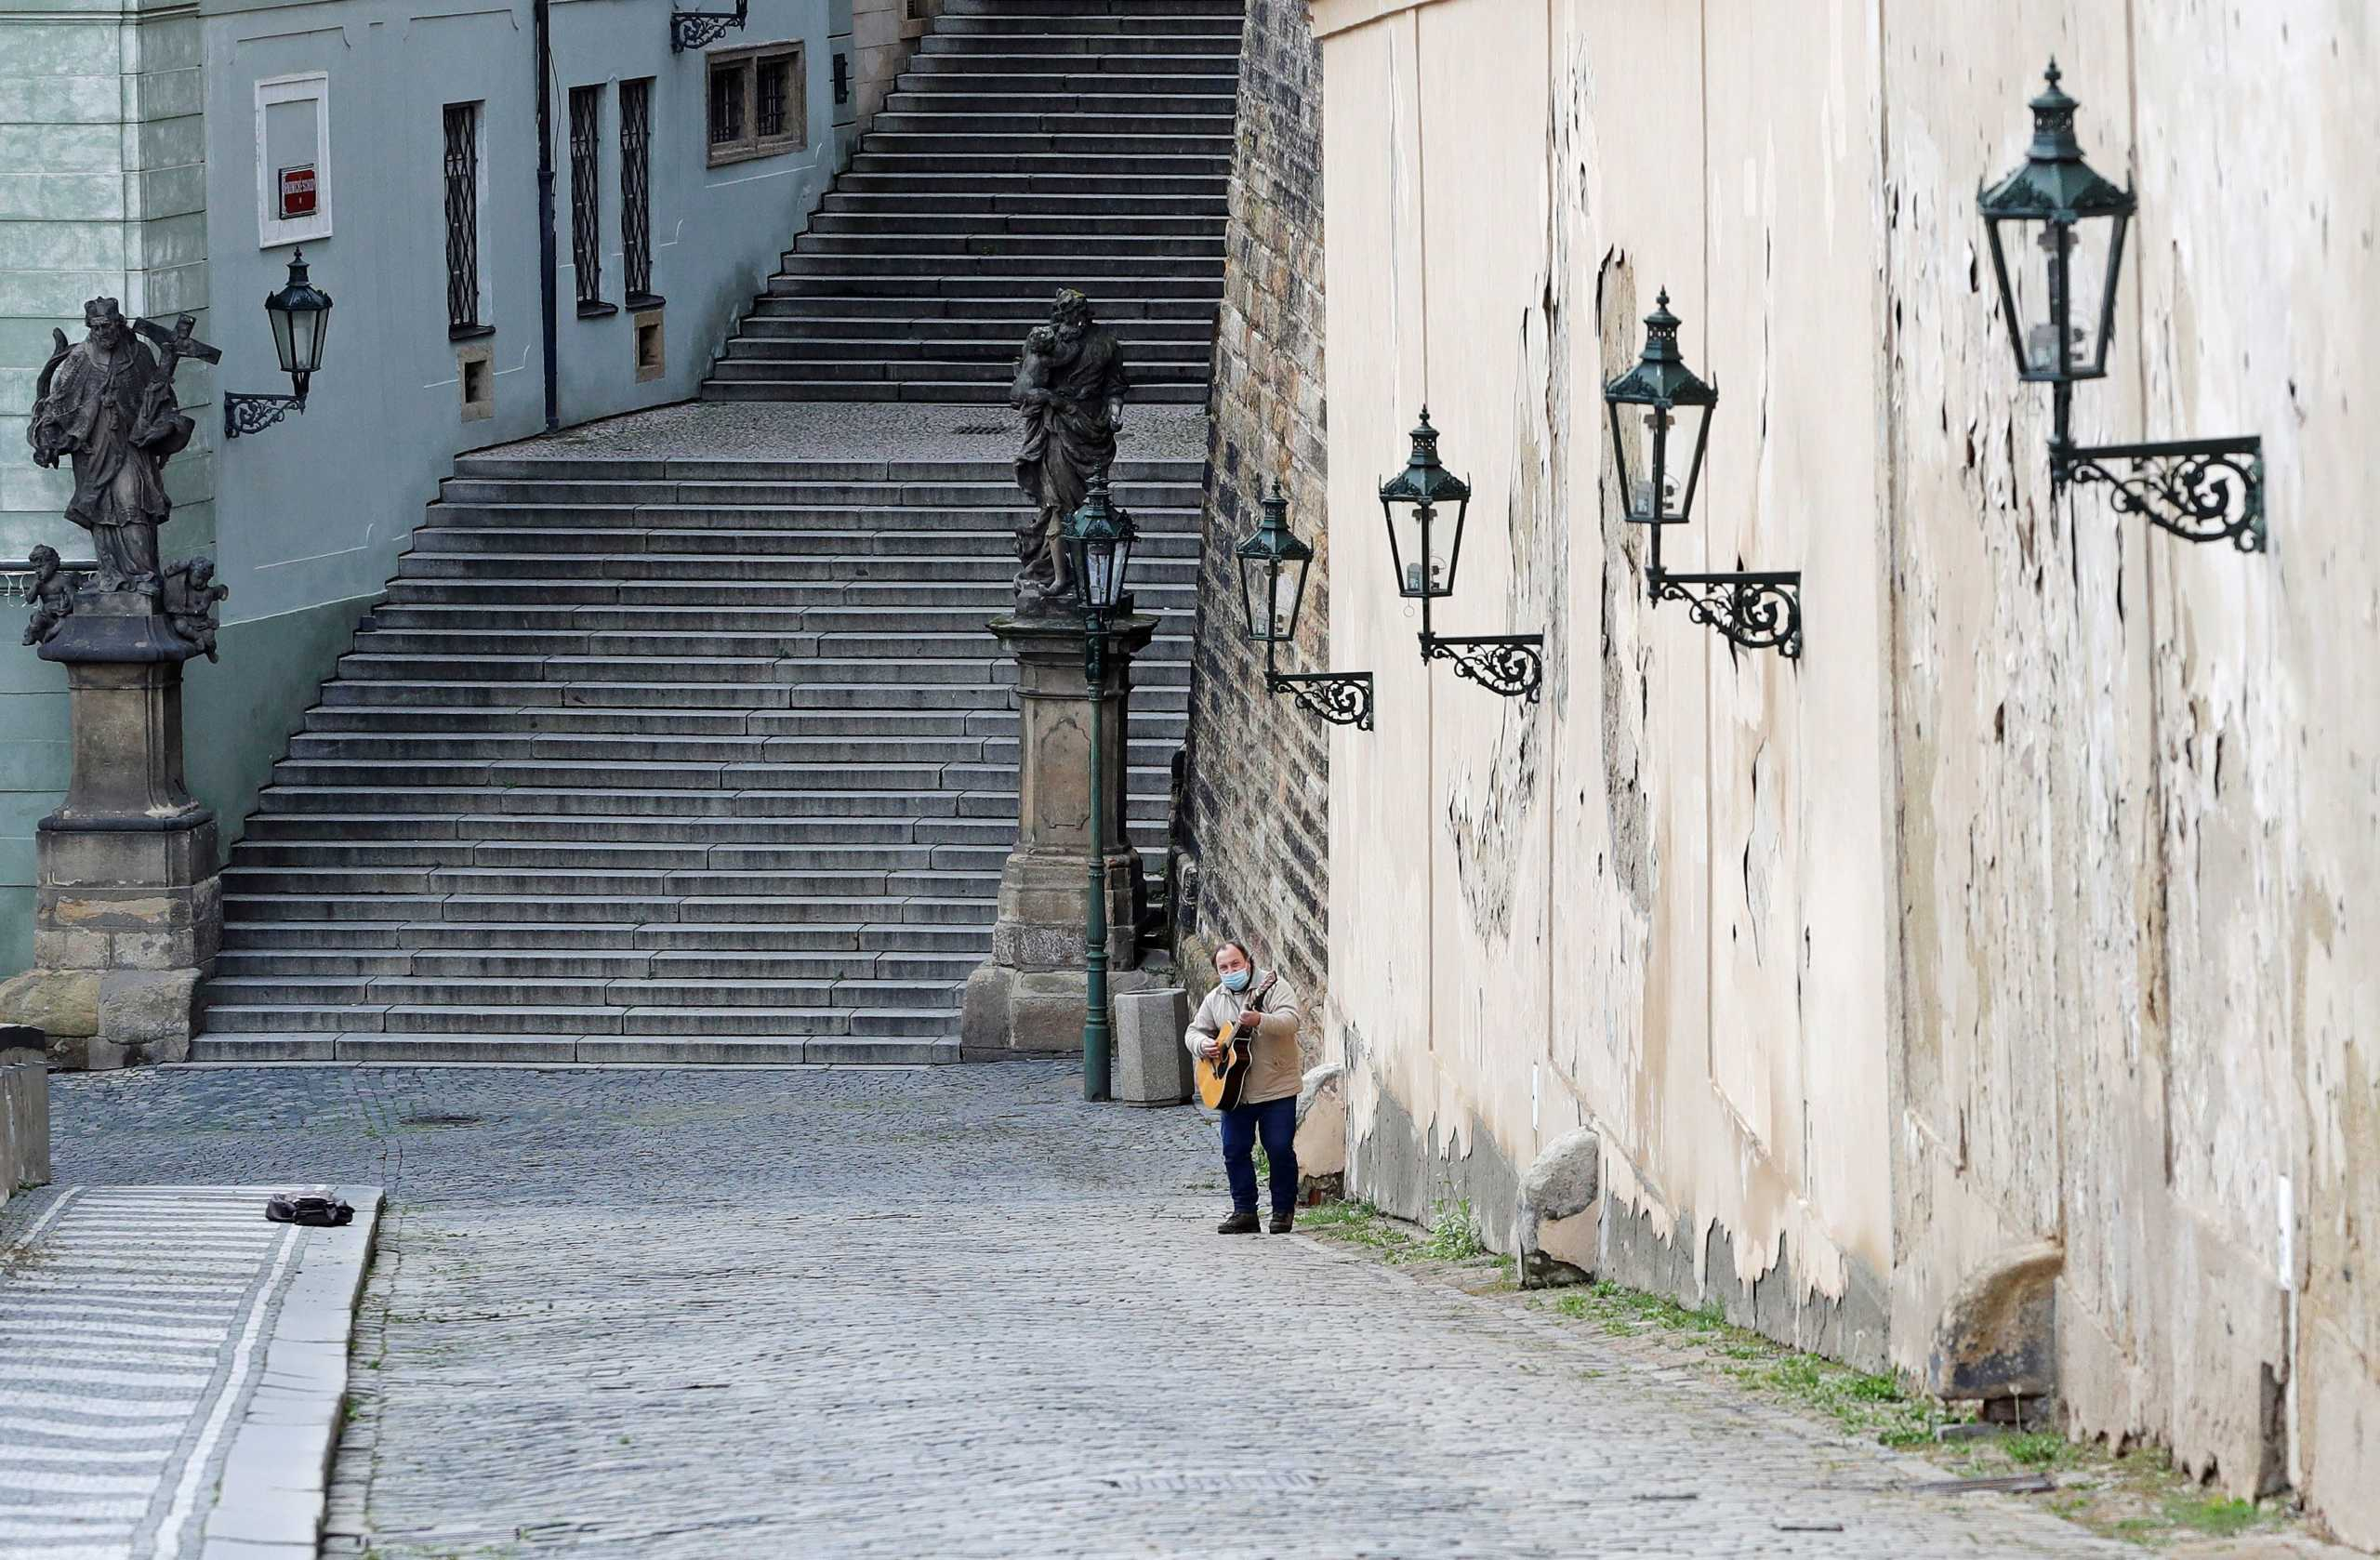 Kορονοϊός: Παρατείνεται η κατάσταση έκτακτης ανάγκης στην Τσεχία